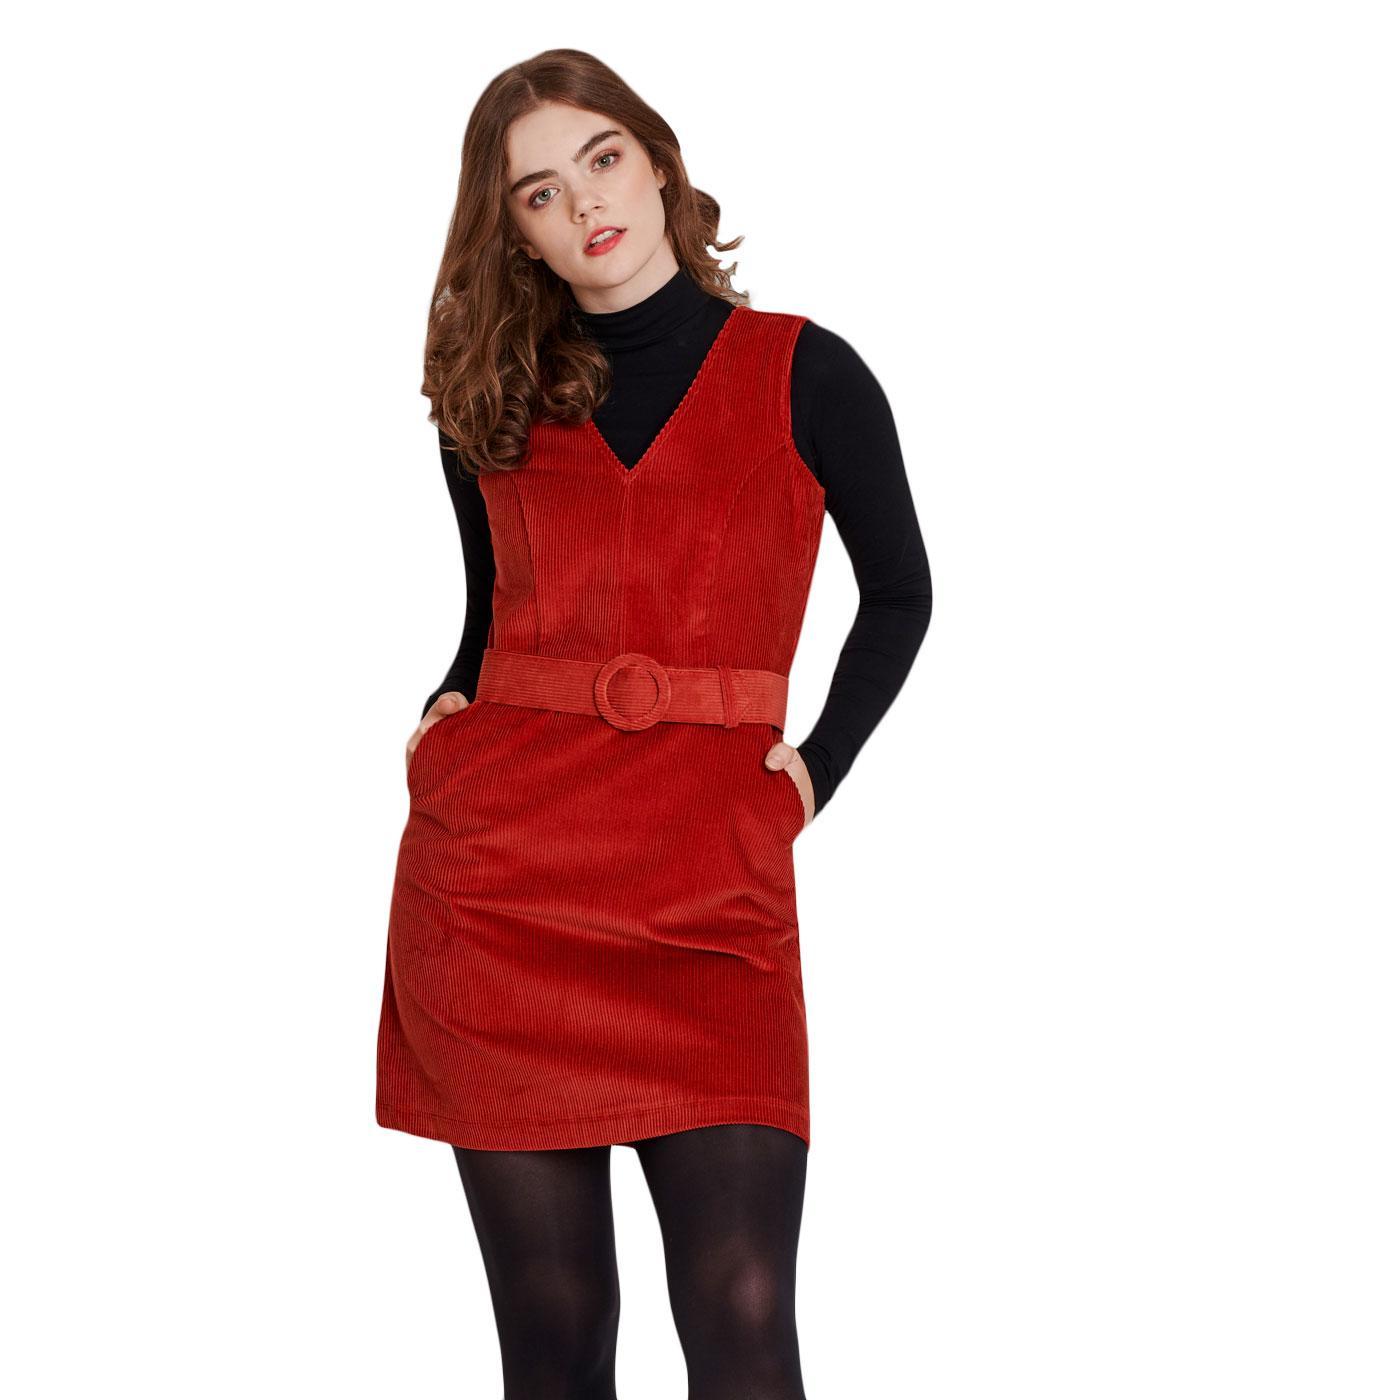 Viva La Groove MADEMOISELLE YEYE Retro Cord Dress